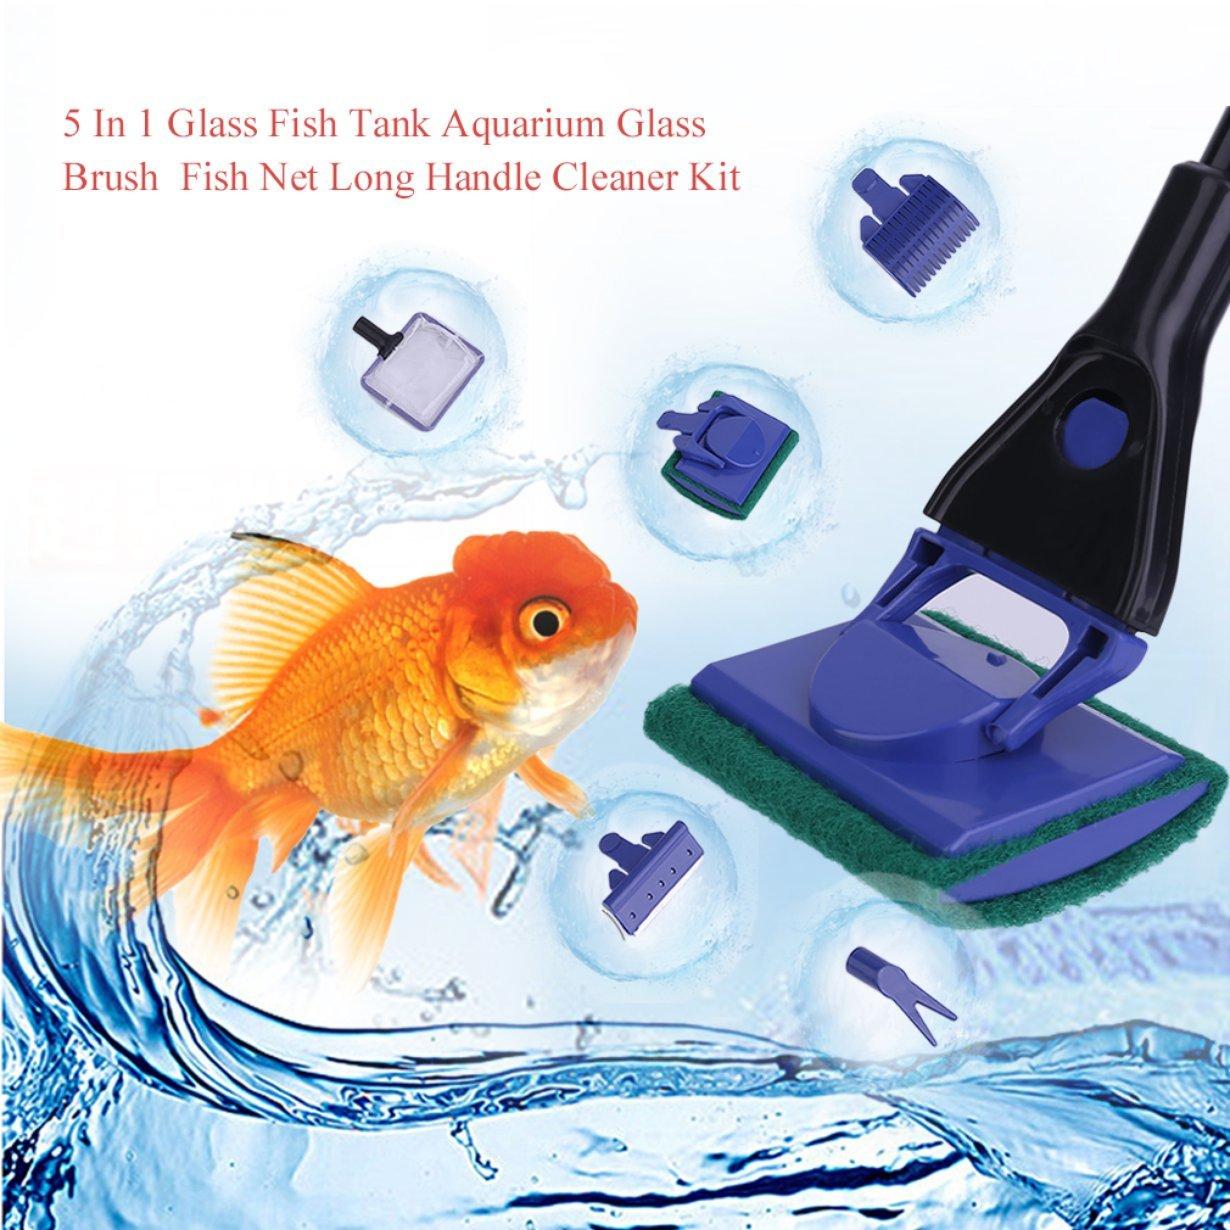 Pet Supplies Comomingo Practical 5 In 1 Glass Fish Tank Aquarium Glass Brush Fish Net Long Handle Cleaner Gravel Rake Algae Scraper Cleaning Tool Dematting Tools